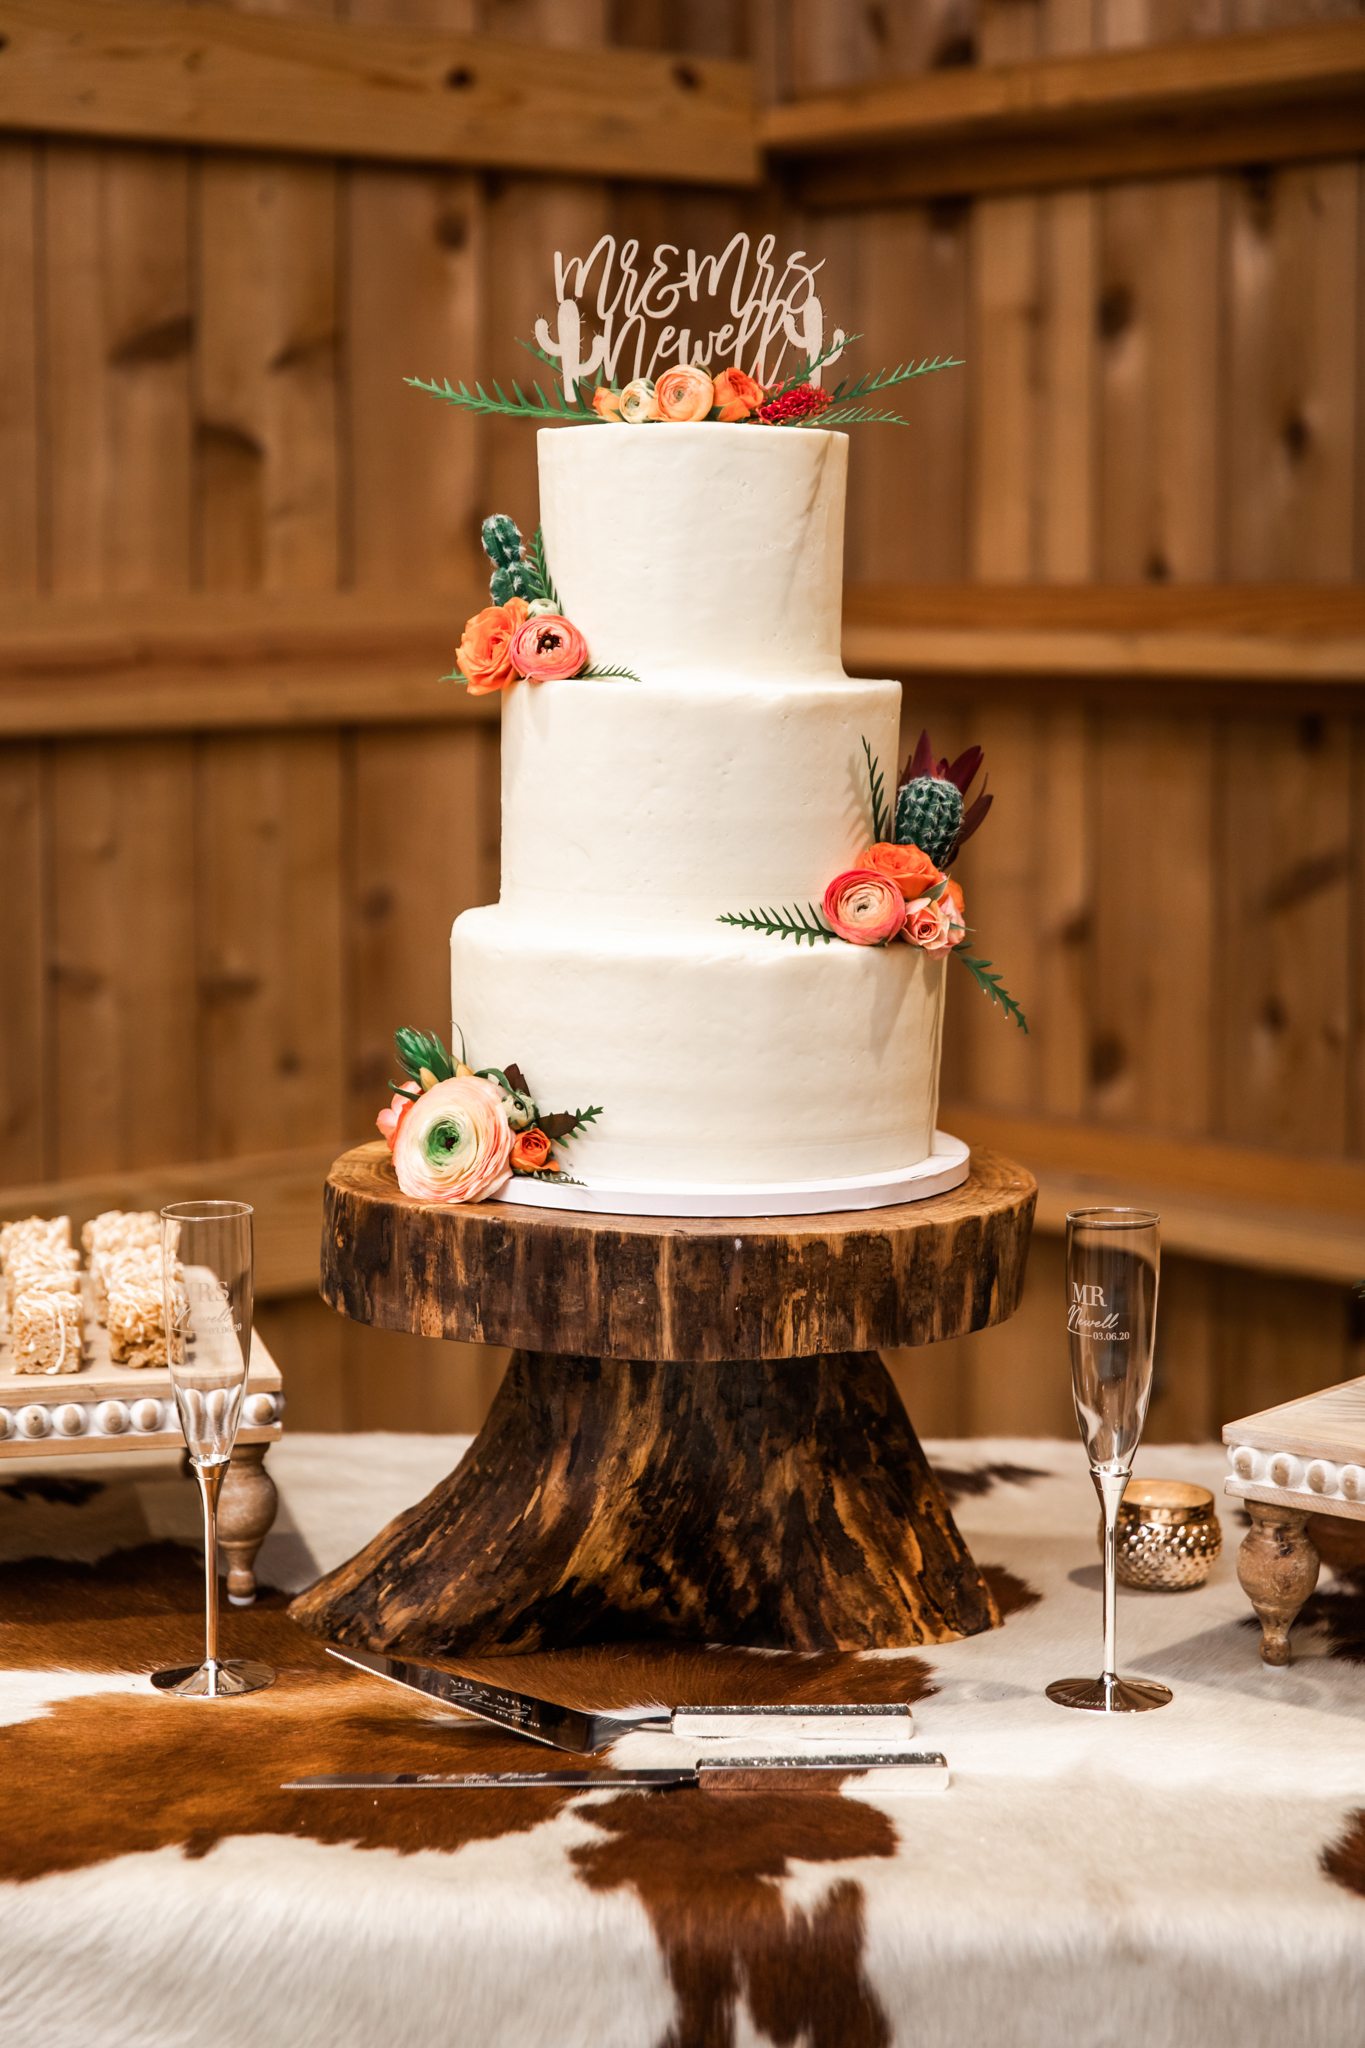 Rustic Wedding Cake: Desert Wedding Ideas featured on Nashville Bride Guide